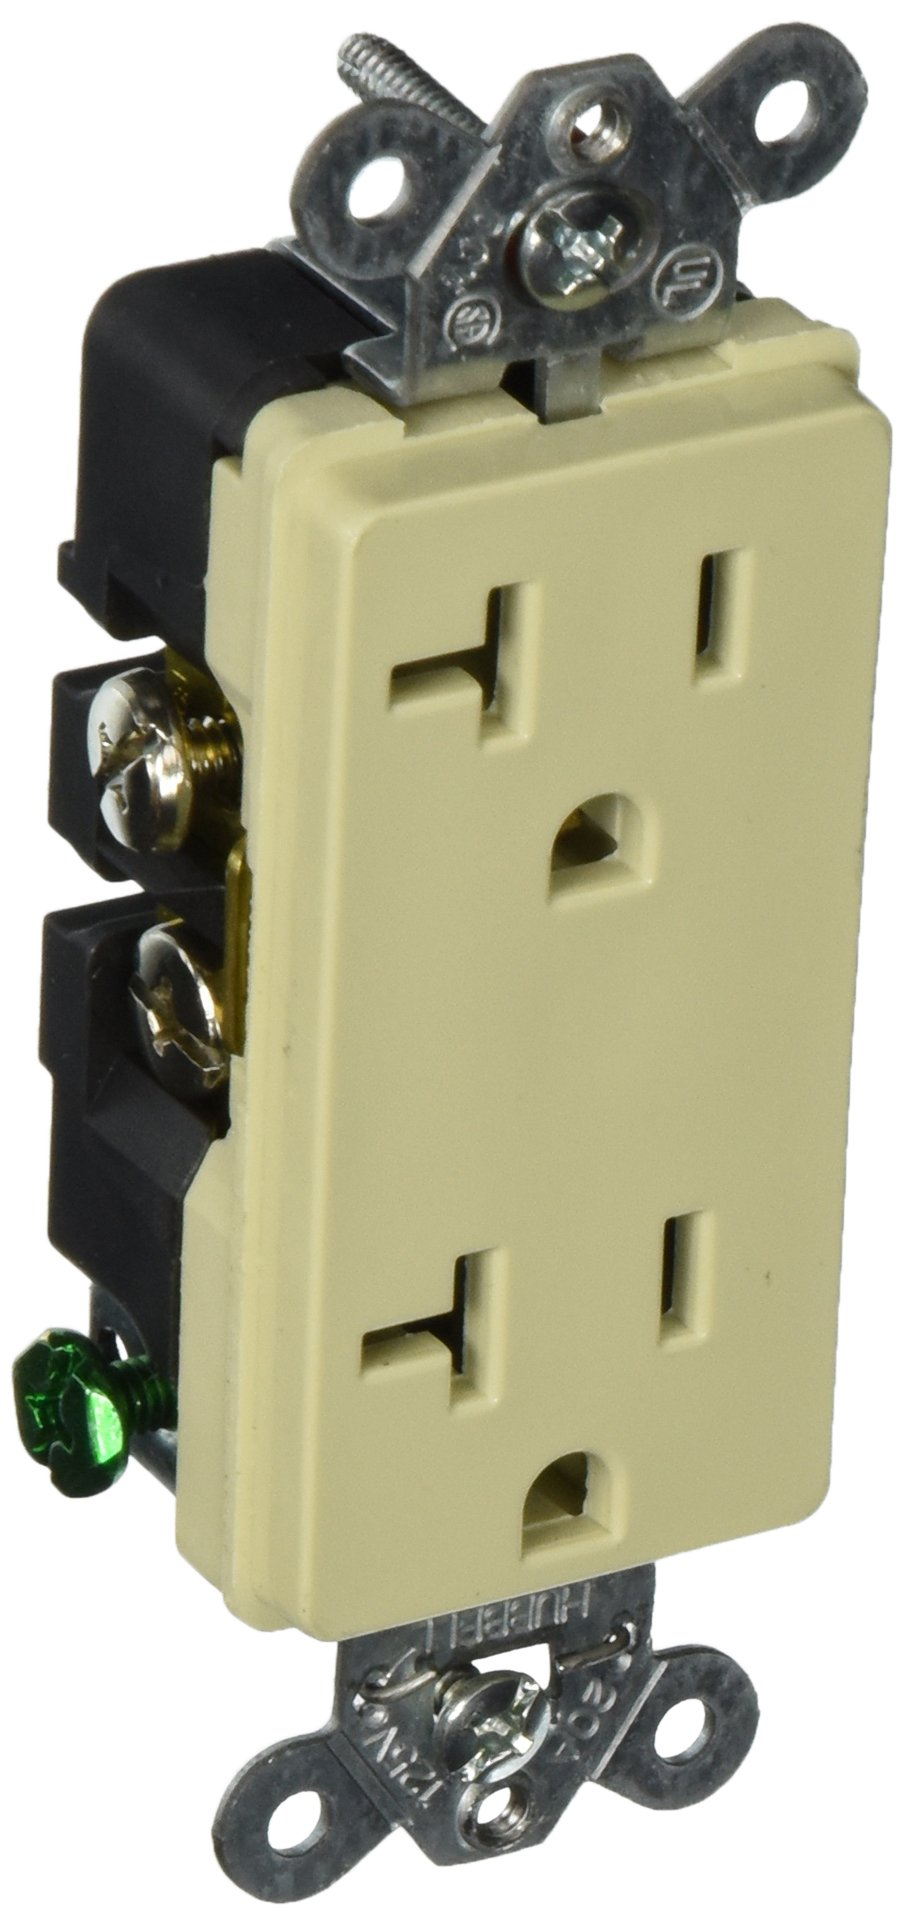 Hubbell HBL2162I Decorator-Style Duplex Receptacle, 20 amp, 125V, 5-20R, Ivory